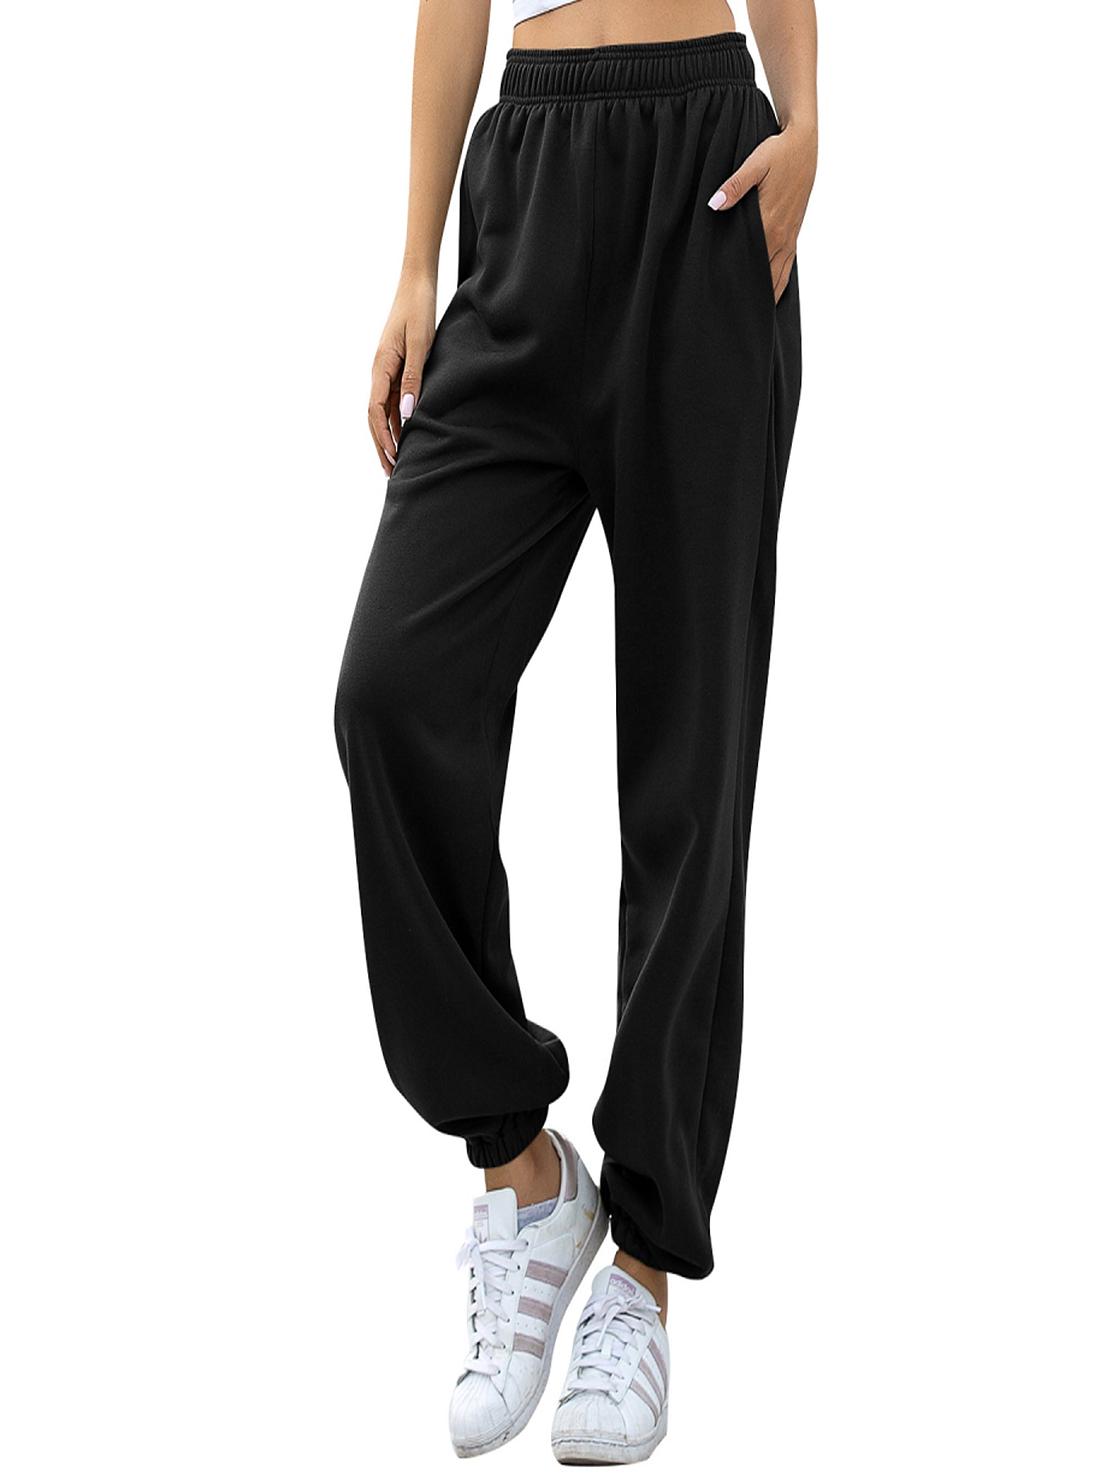 10 Wholesale Women's Loose Jogger Pants